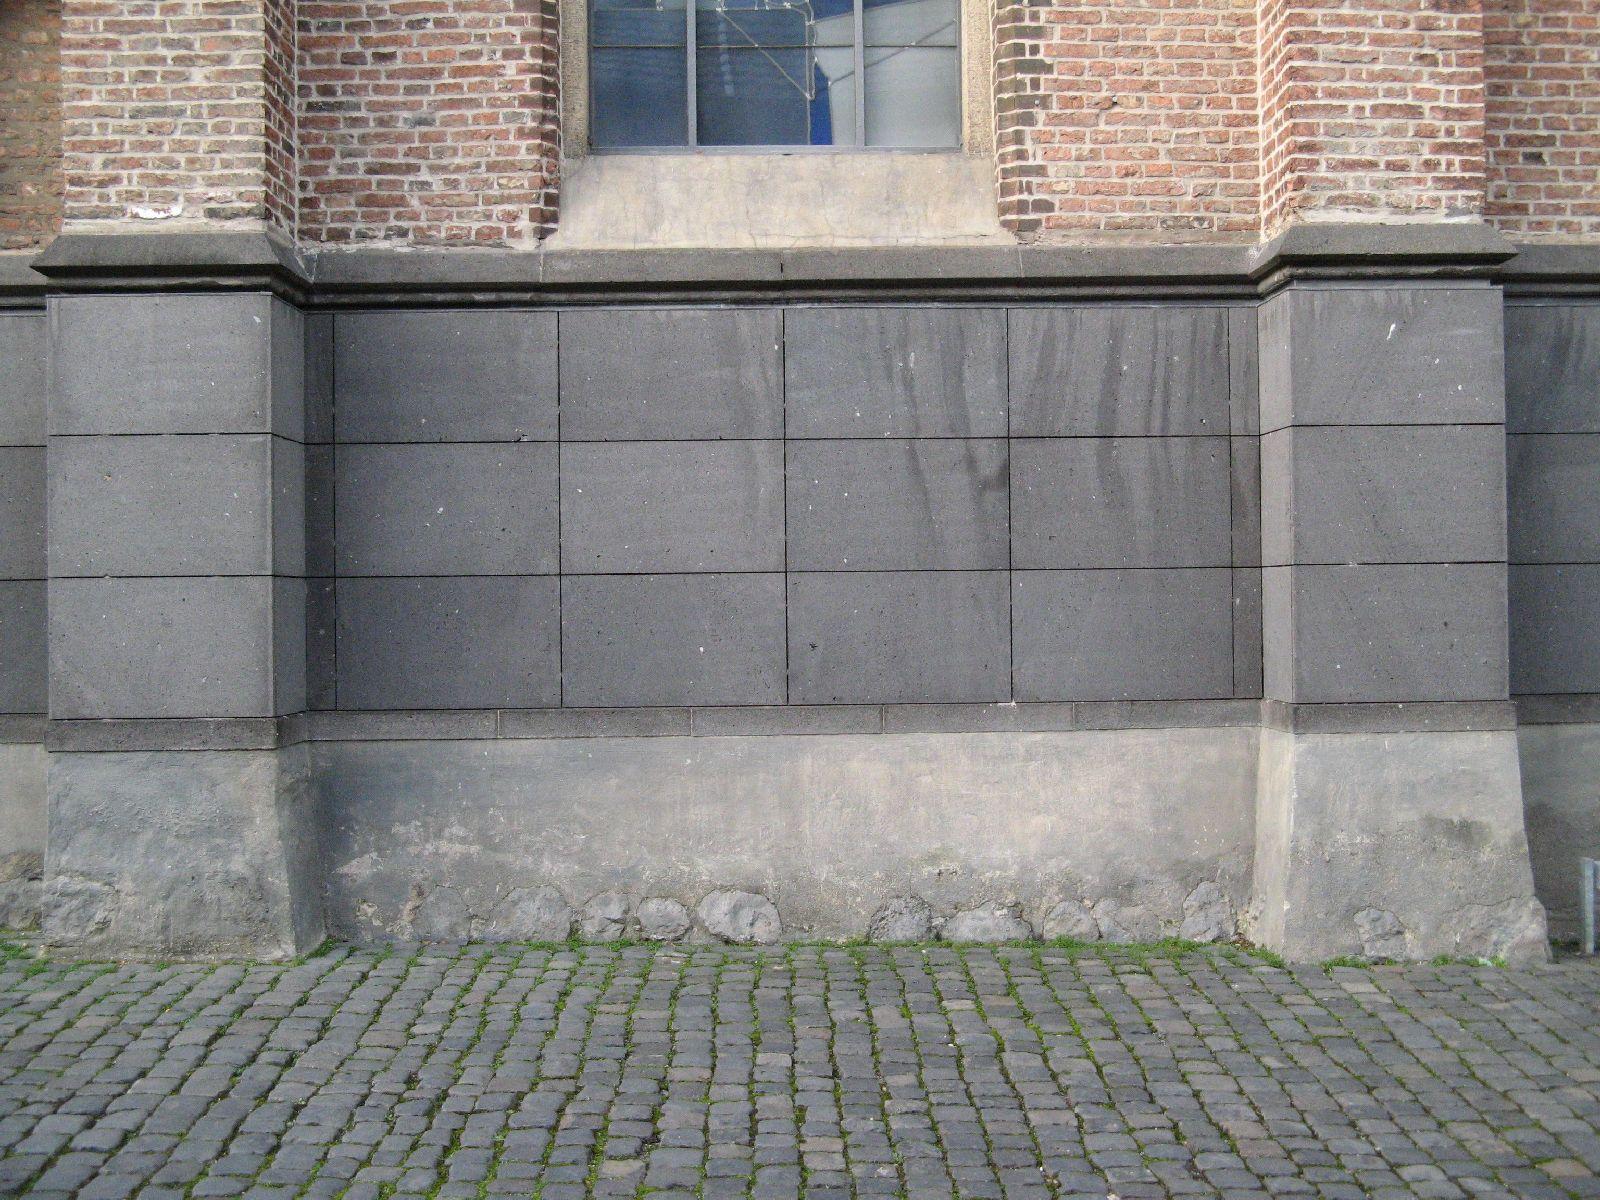 Brick_Texture_B_03785